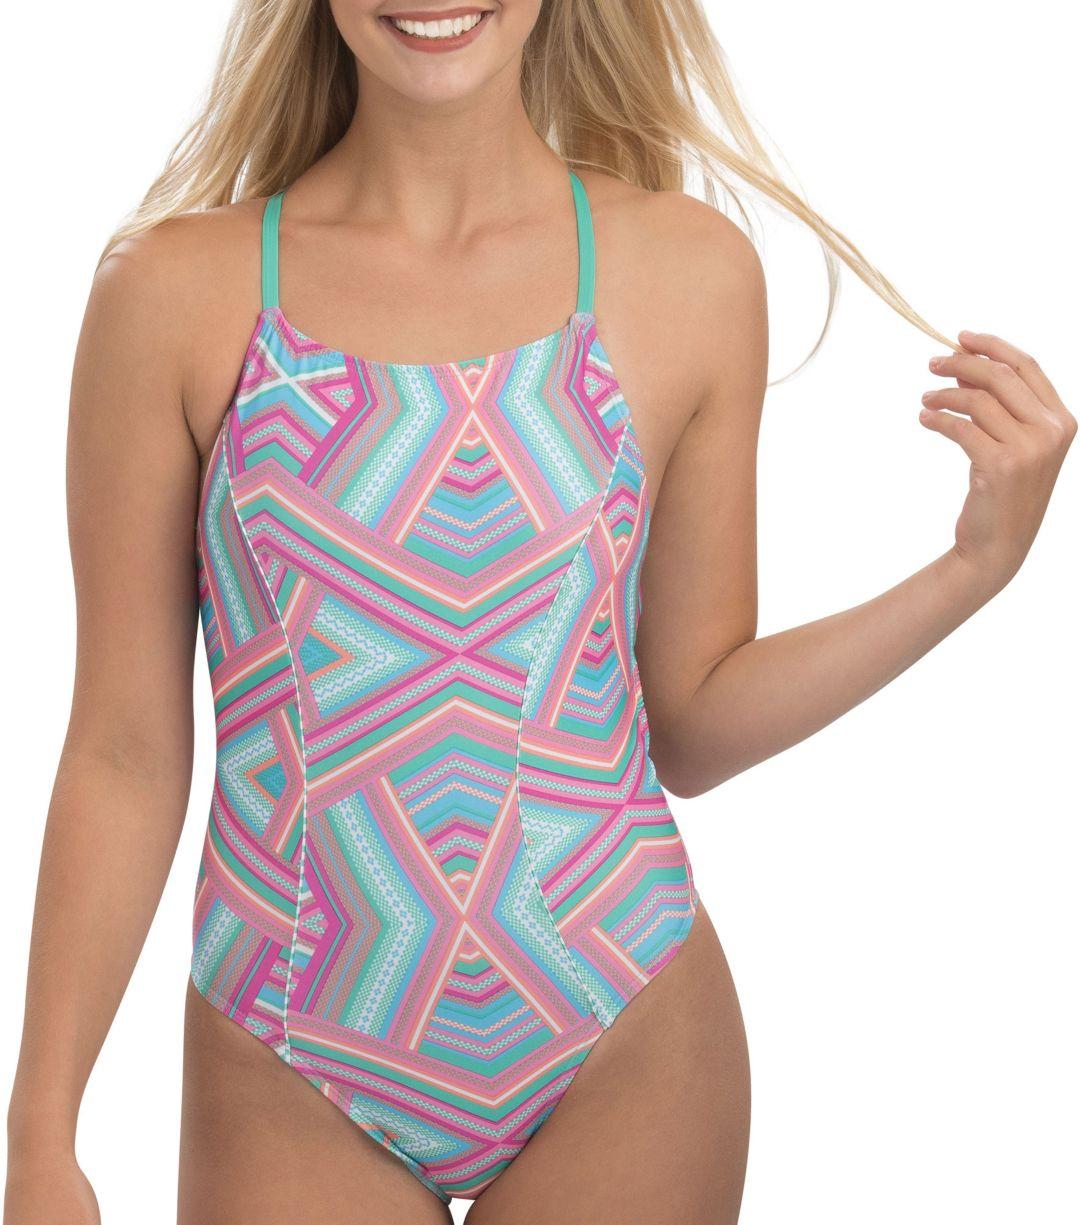 66c5021d824 Dolfin Women's Uglies Revibe Print Diamondback One Piece Swimsuit.  noImageFound. Previous. 1